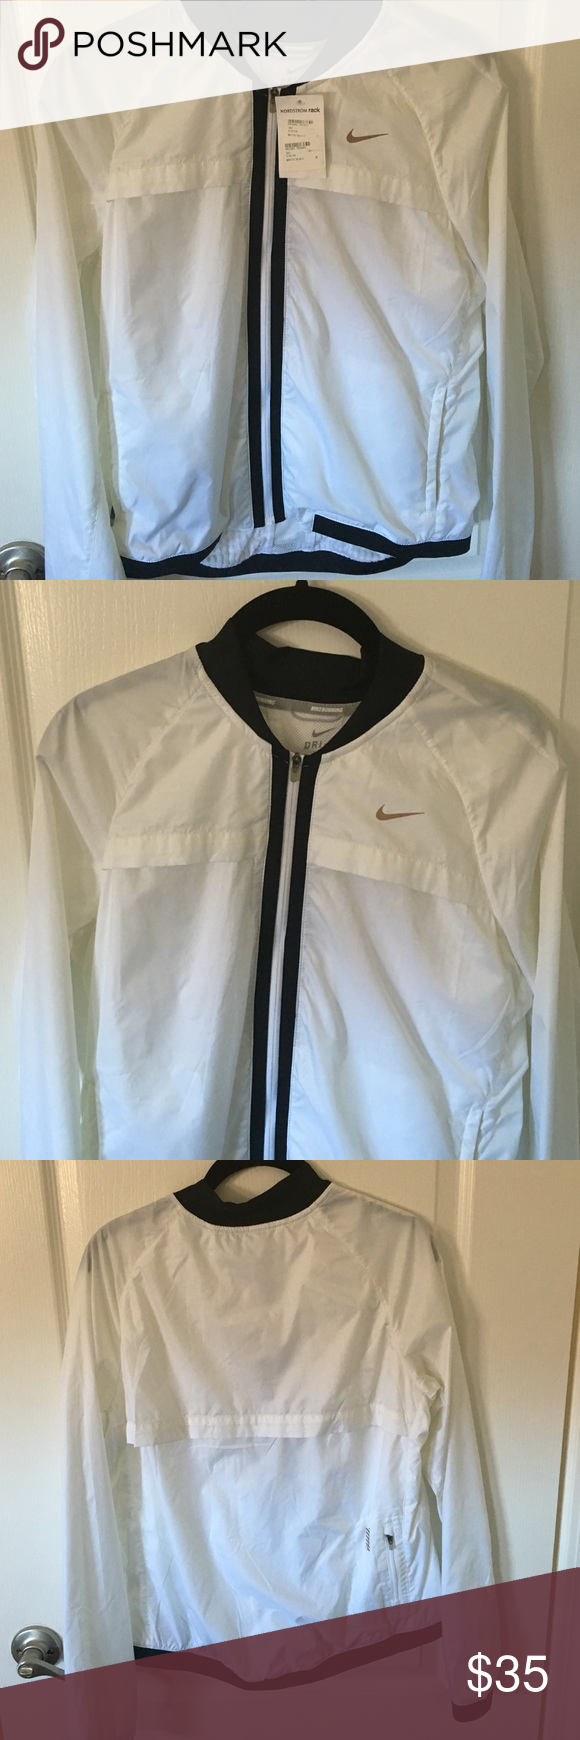 White Nike Running Jacket Brand new white Nike running jacket Nike Jackets & Coats